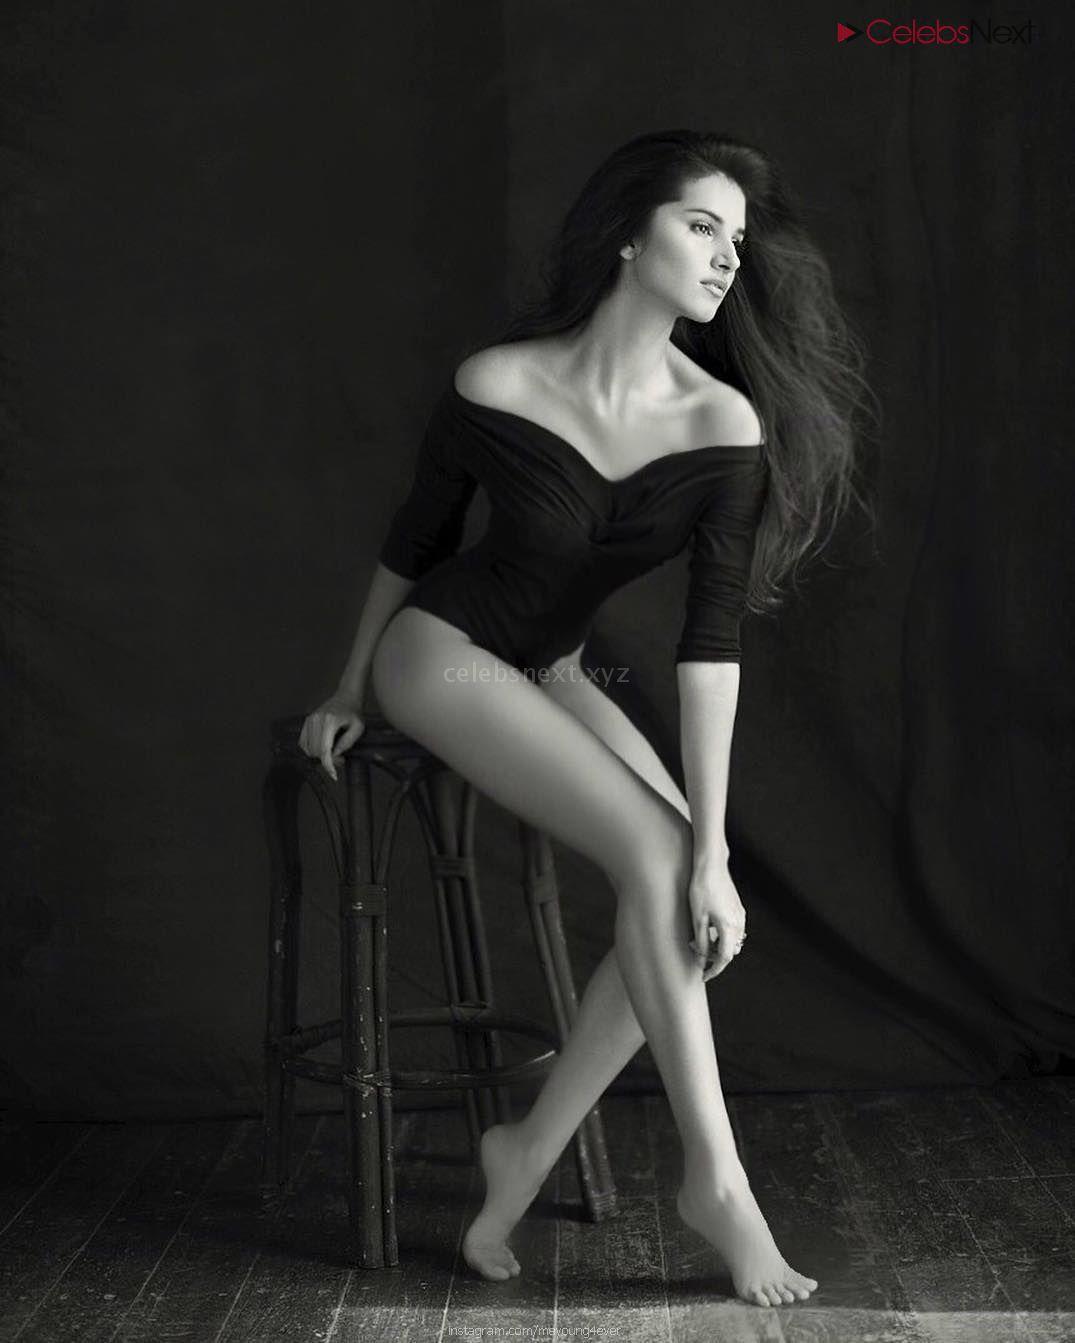 Tara Sutaria Actress of movie Student Of The Year 2 - Sizzling Bikini Lingerie Pics